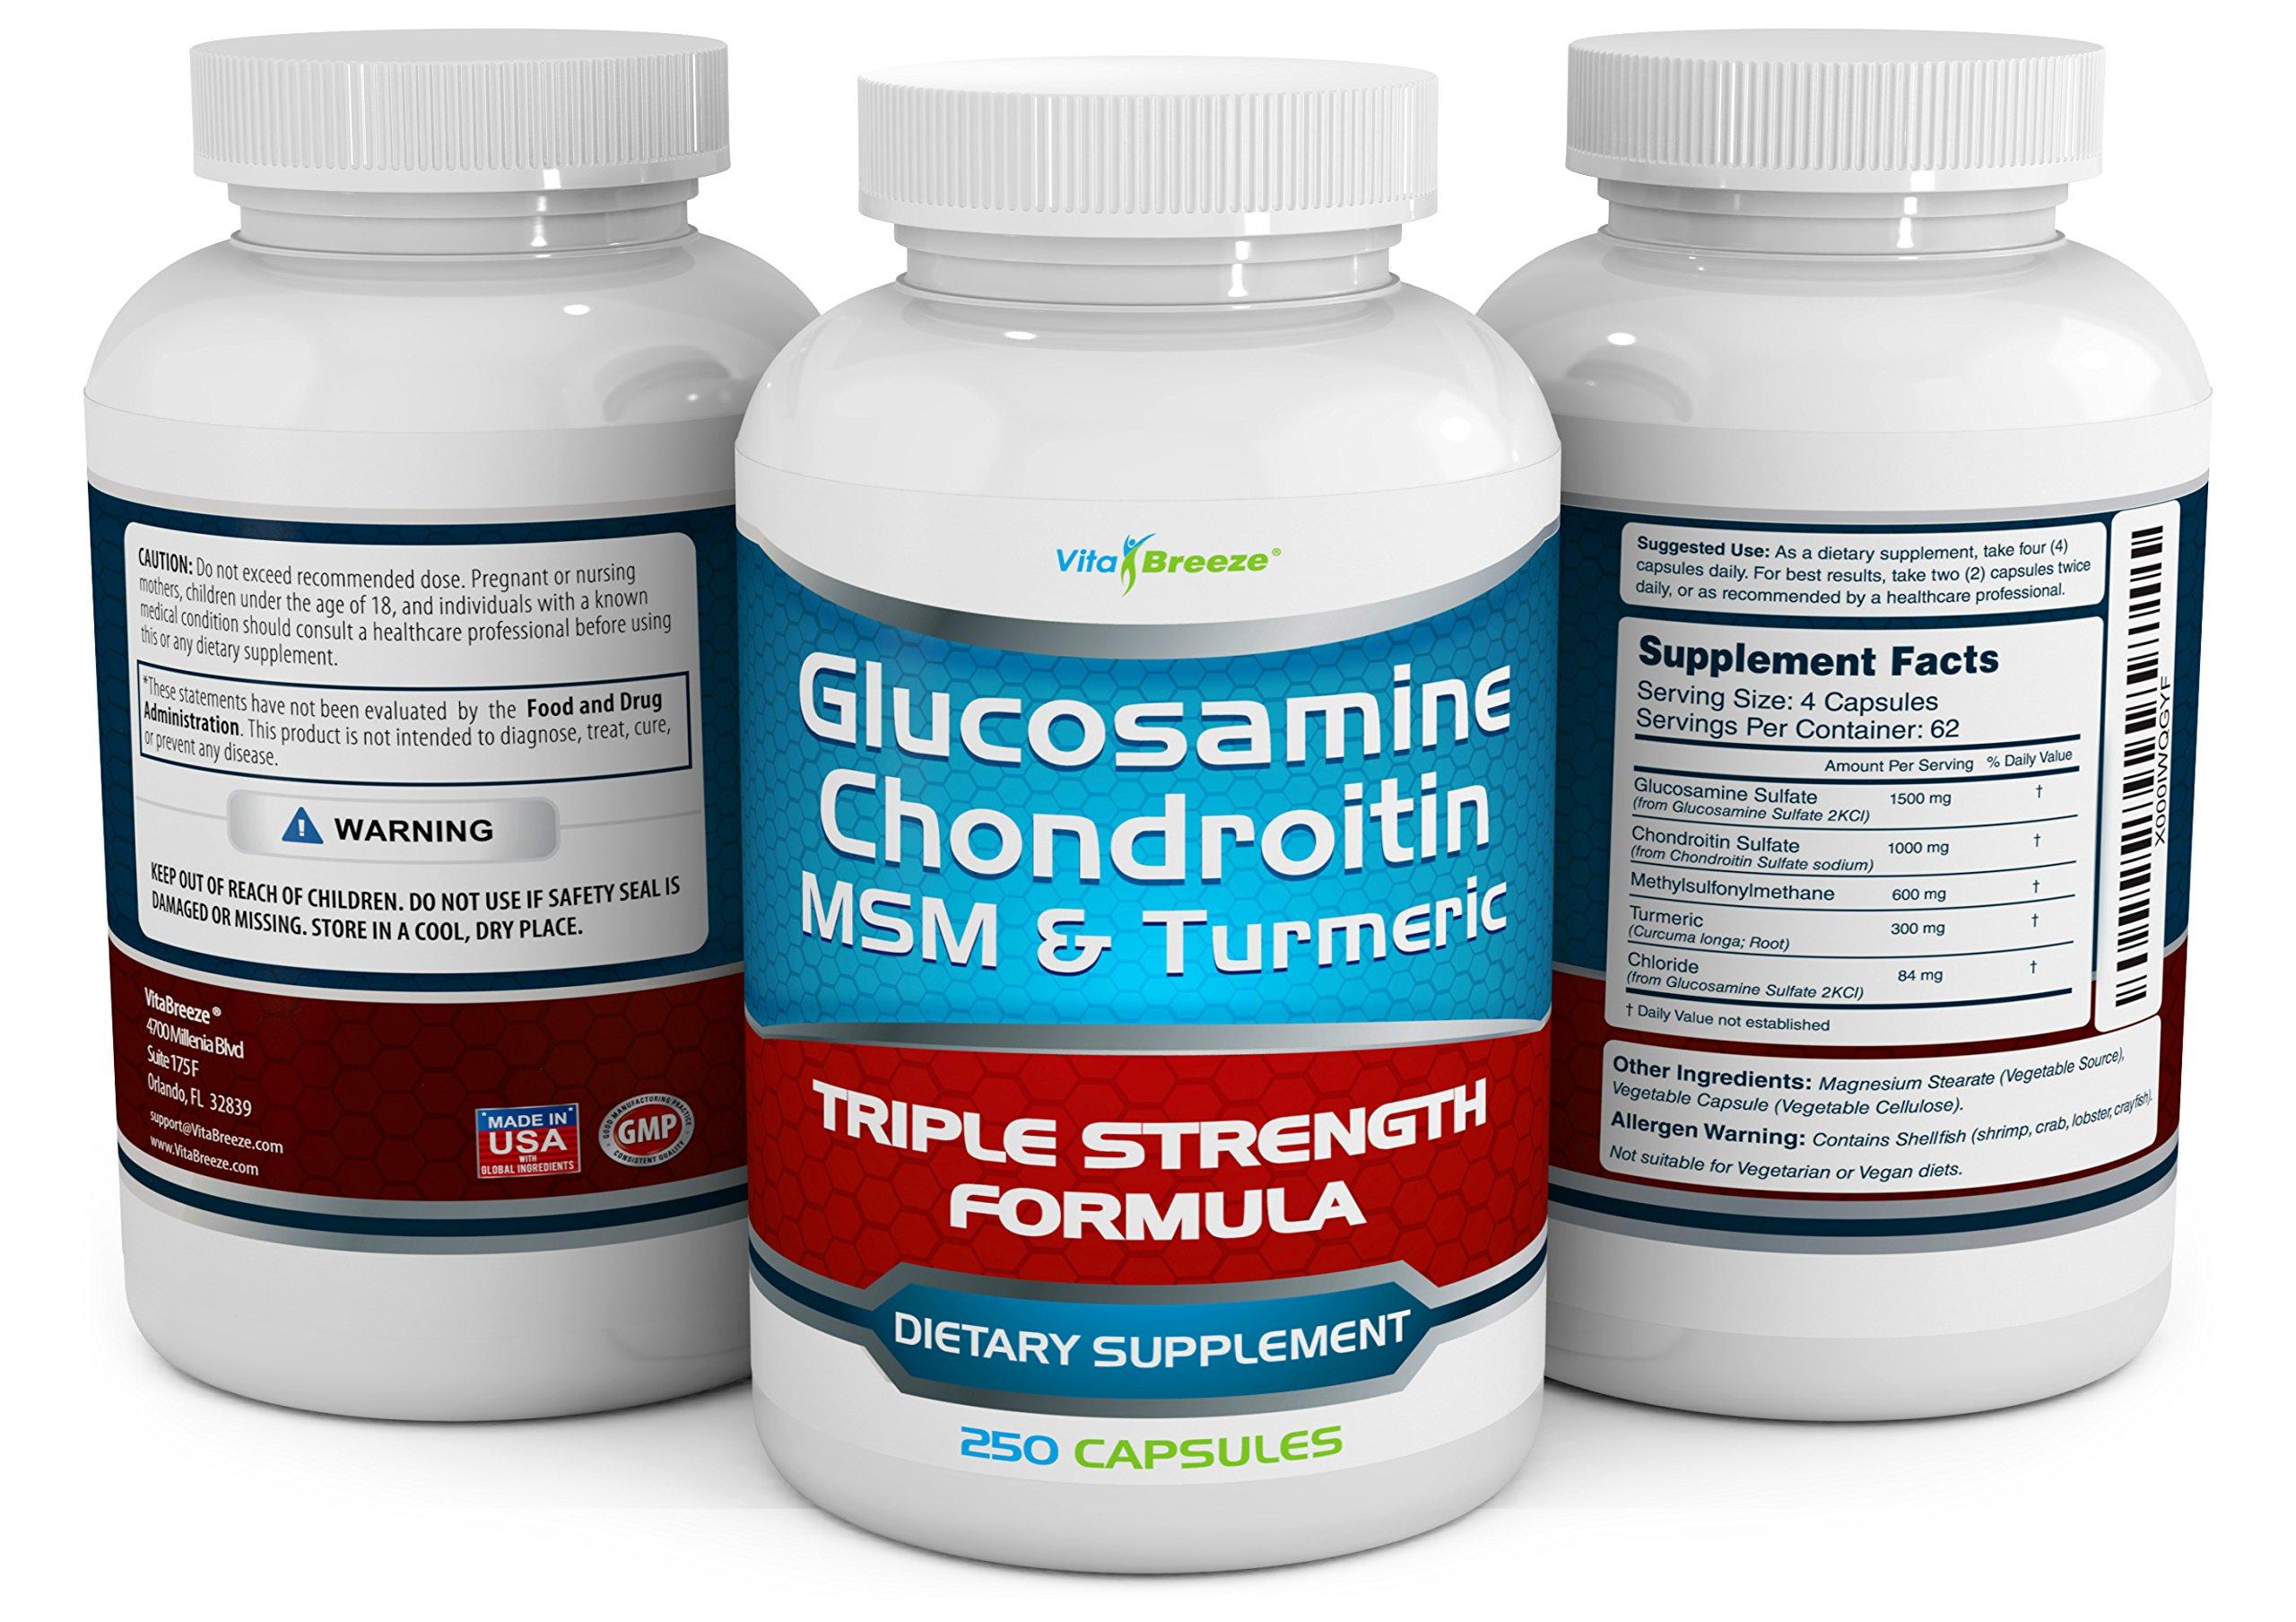 Glucosamine Chondroitin, MSM & Turmeric Dietary Supplement - 250 Capsules by VitaBreeze (Image #4)